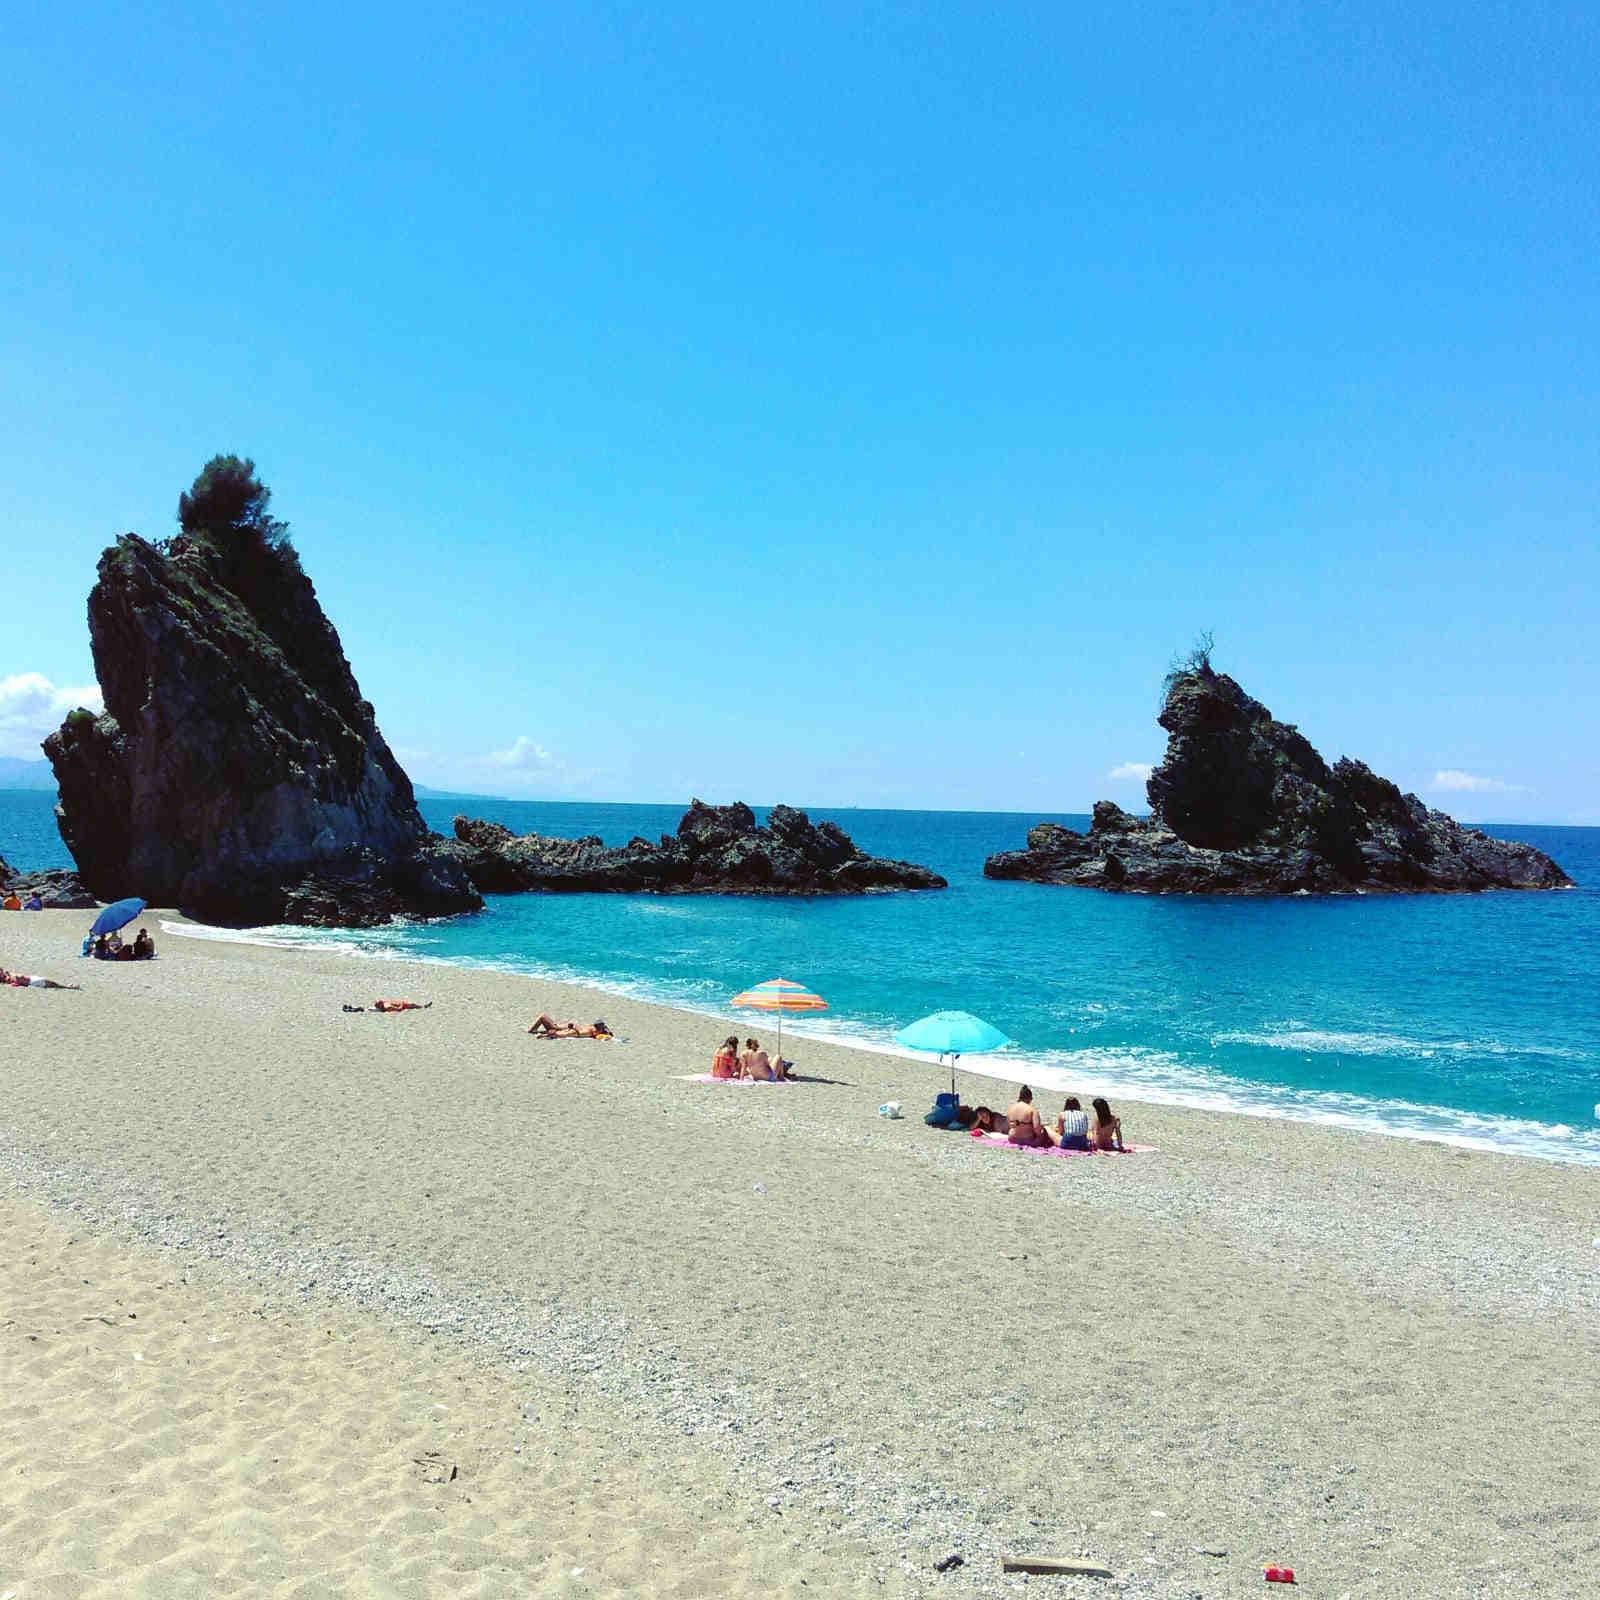 Tonnara a Palmi Costa Viola 10 spiagge più belle a Reggio Calabria